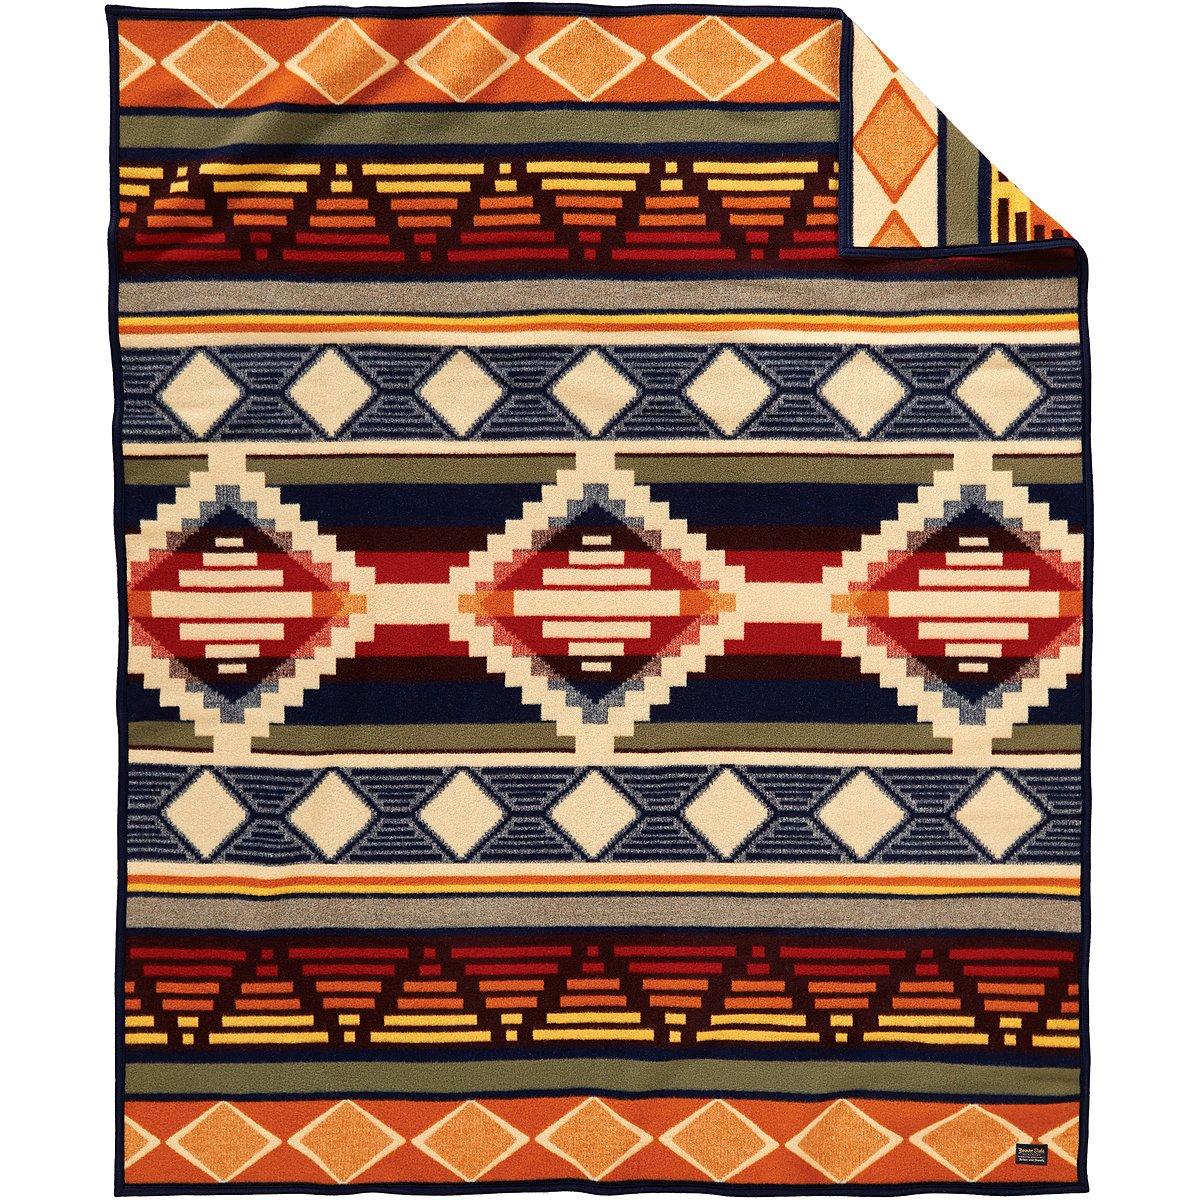 Cedar Mountain Blanket by Pendleton B01IIE5EAA